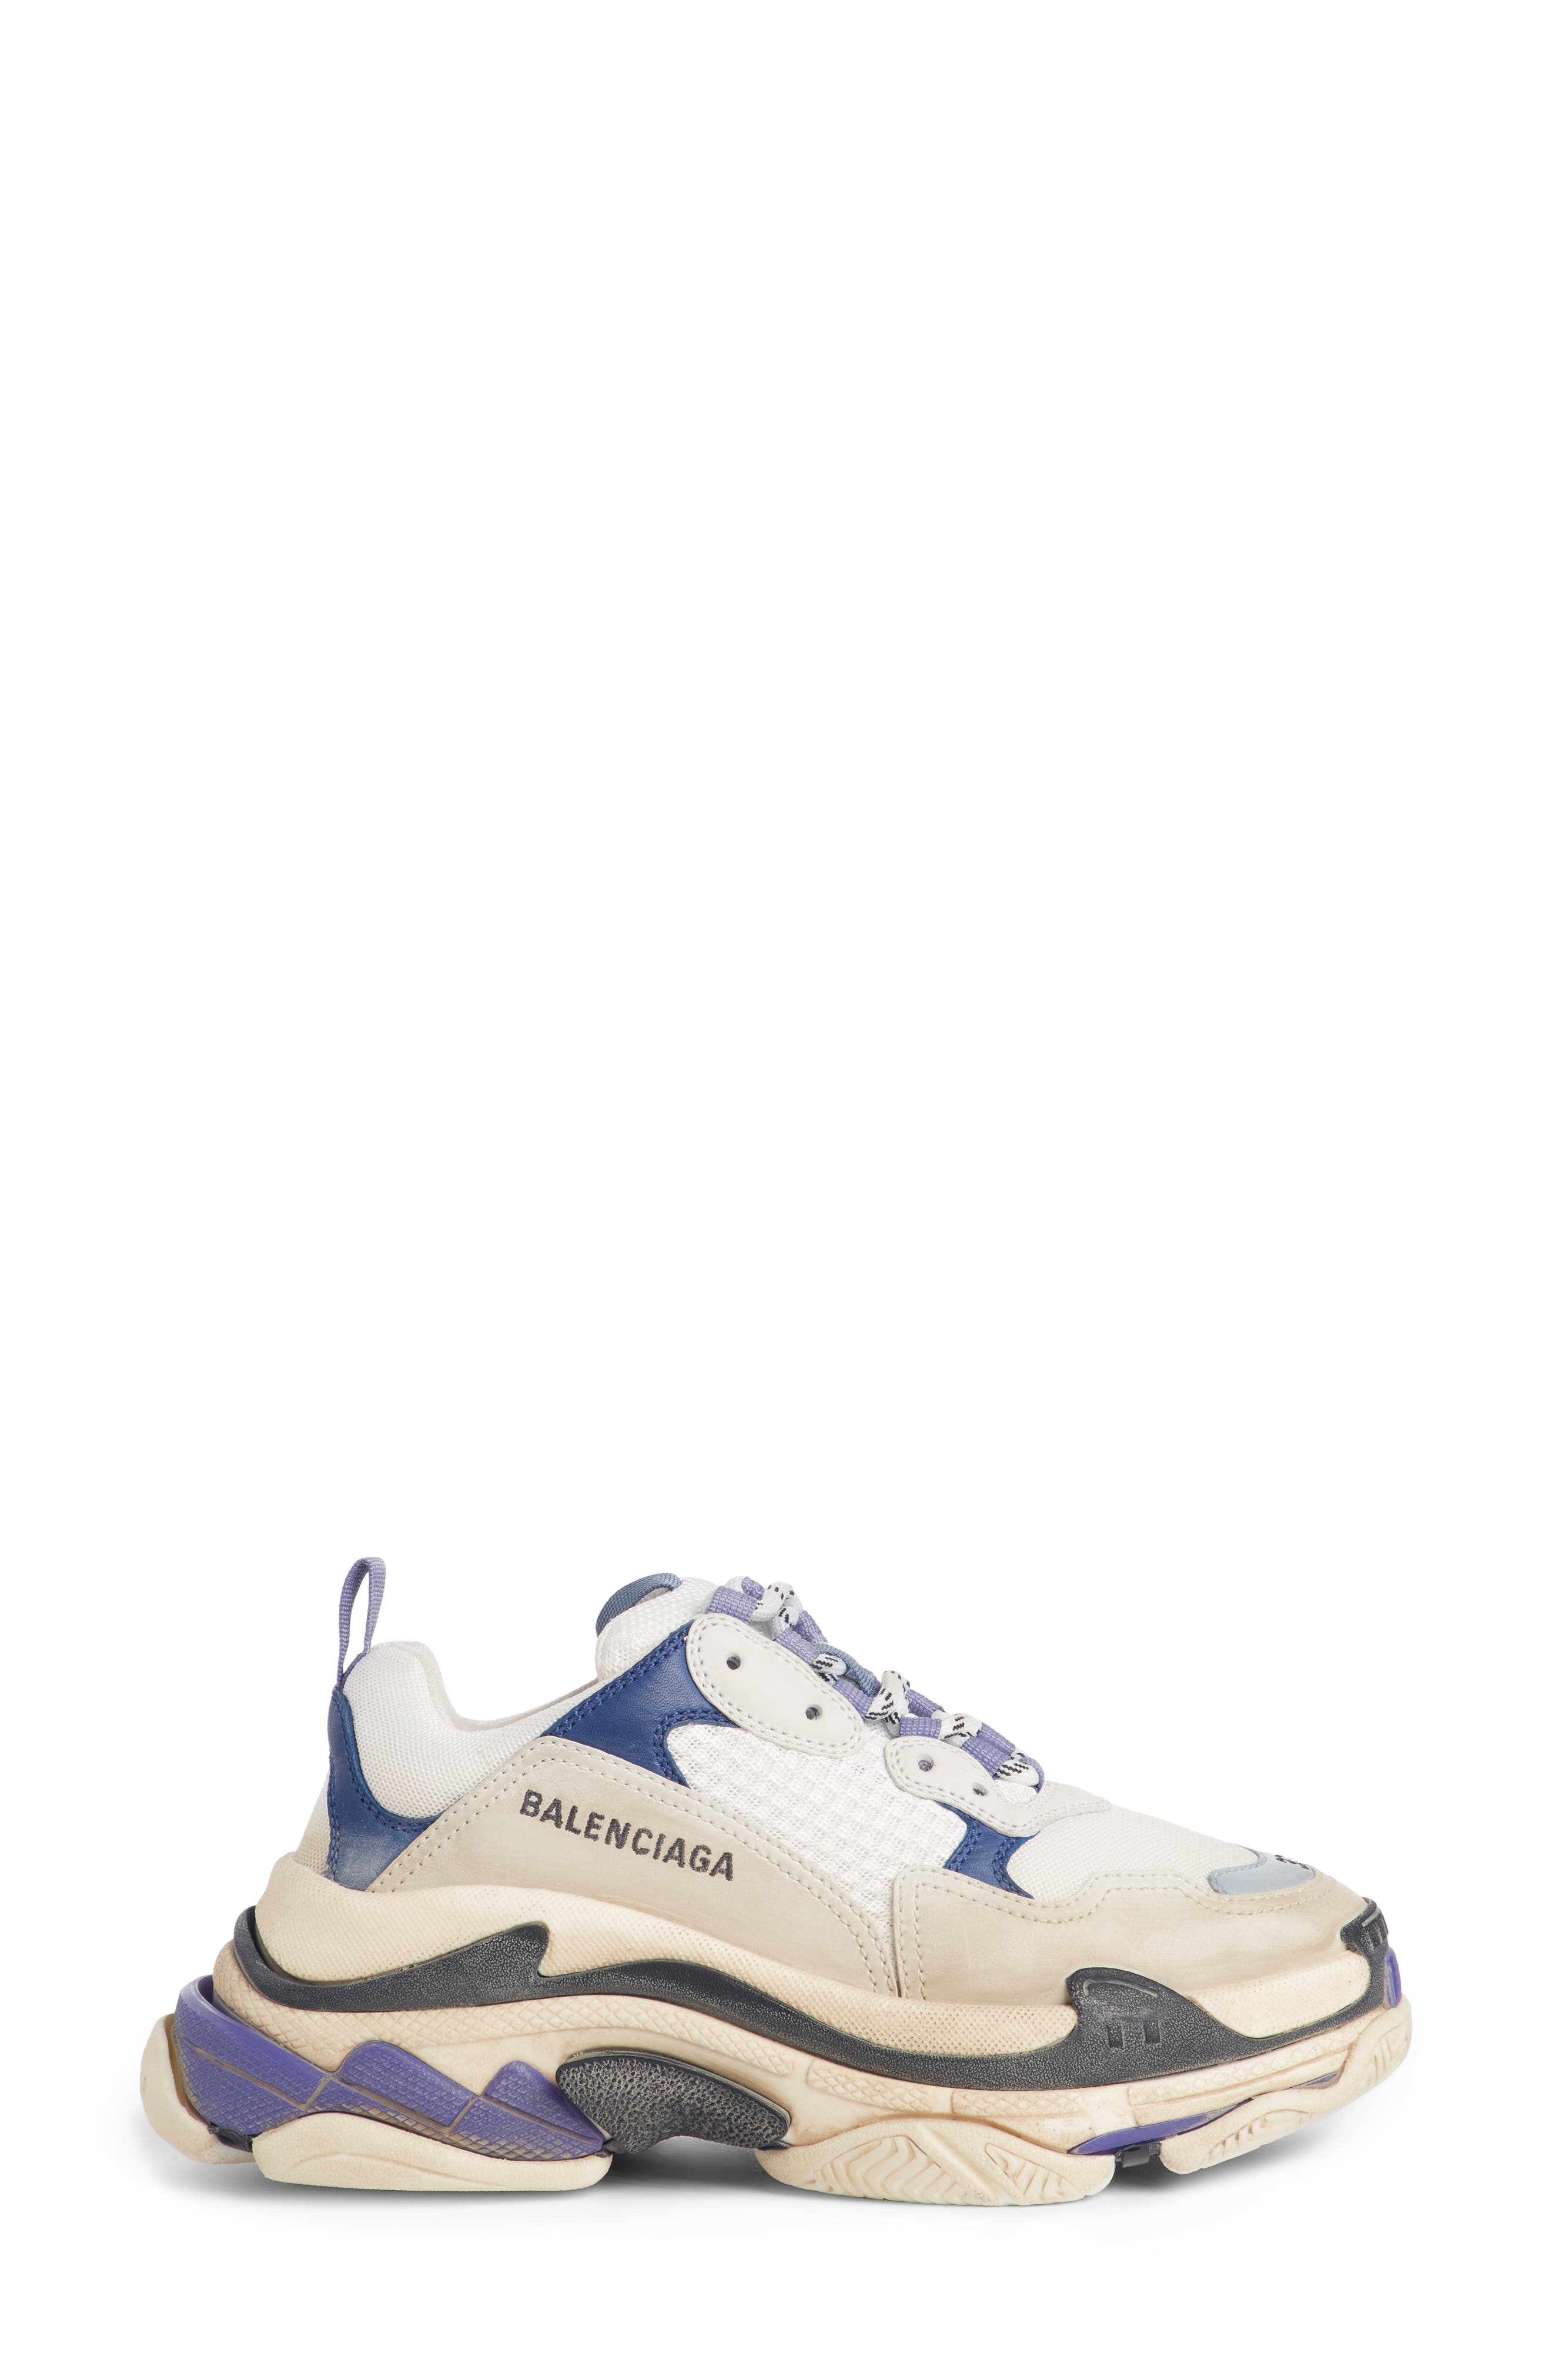 Triple S Sneaker,                             Alternate thumbnail 3, color,                             VIOLET/ WHITE/ BLUE